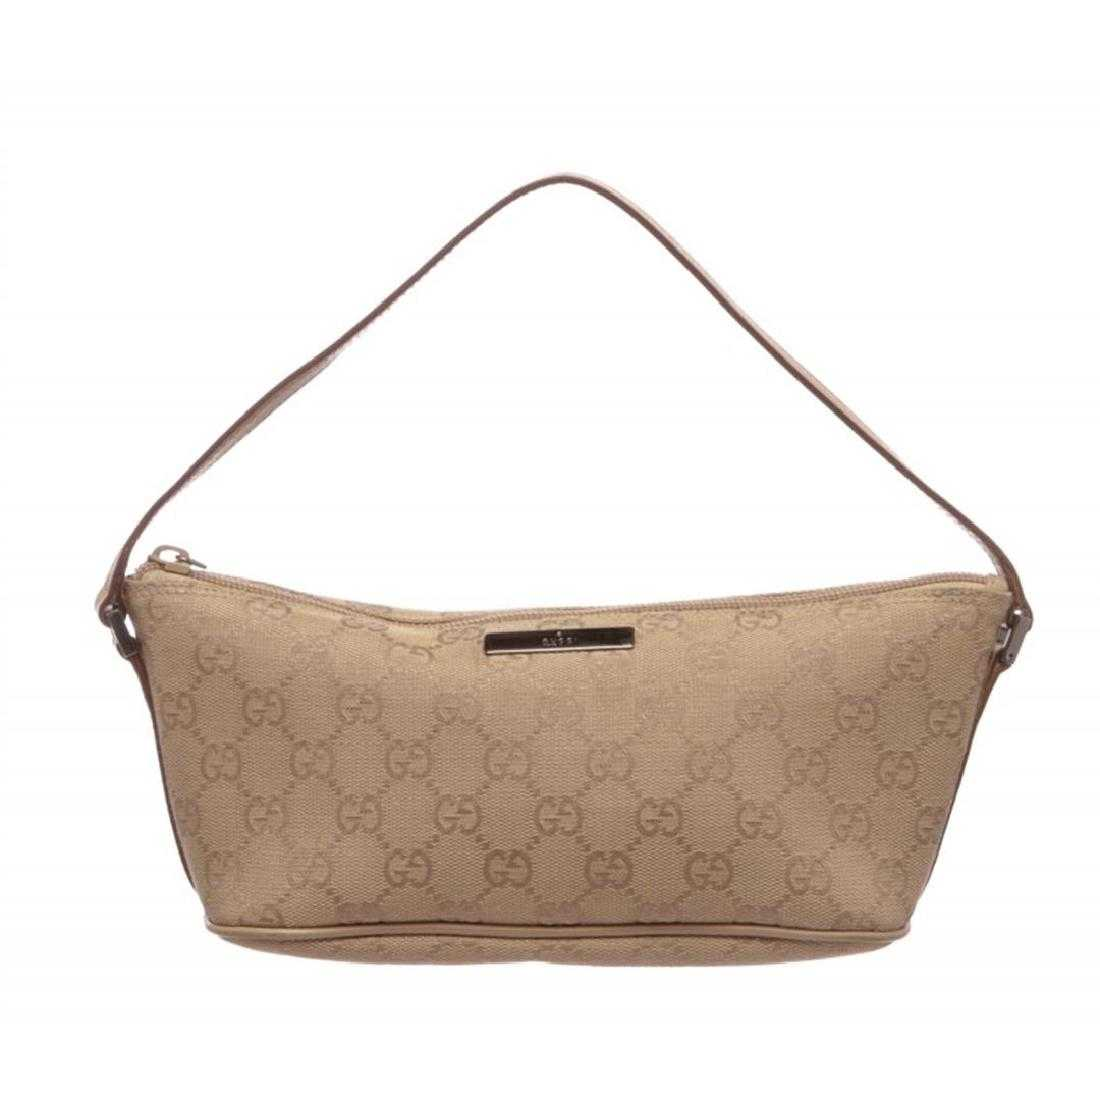 ccb88d1be03c Gucci Brown Beige Canvas Leather Monogram Pochette Bag